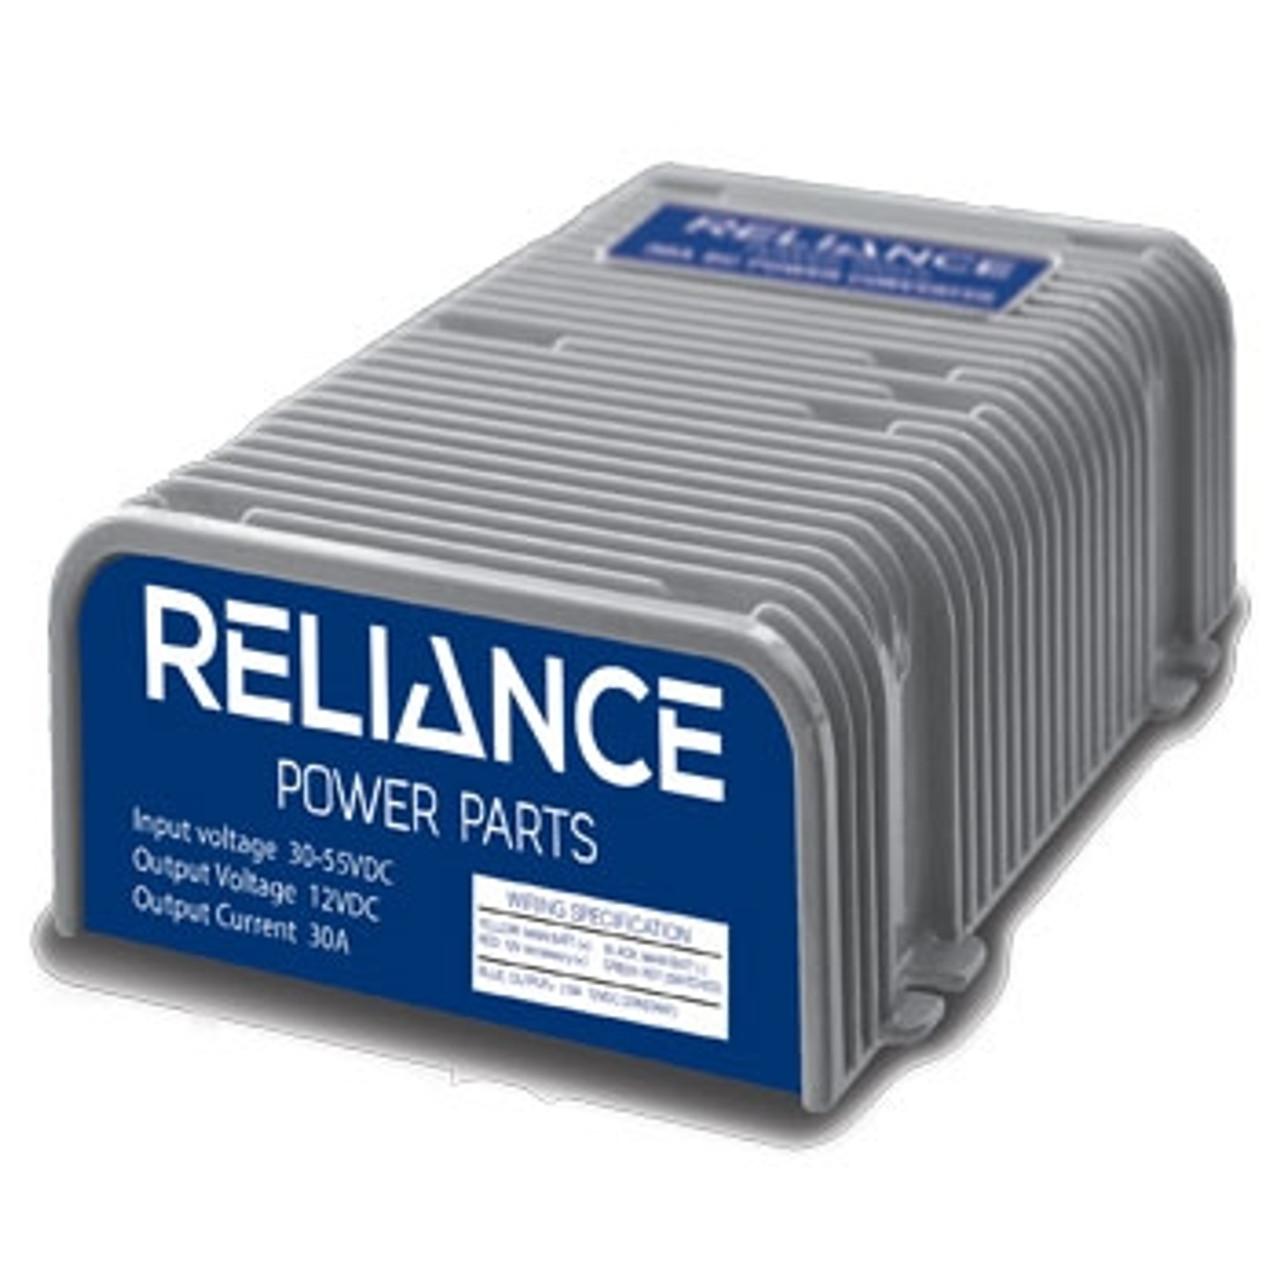 Reliance 36 or 48 Volt to 12 Volt DC Converter - 30 Amp on